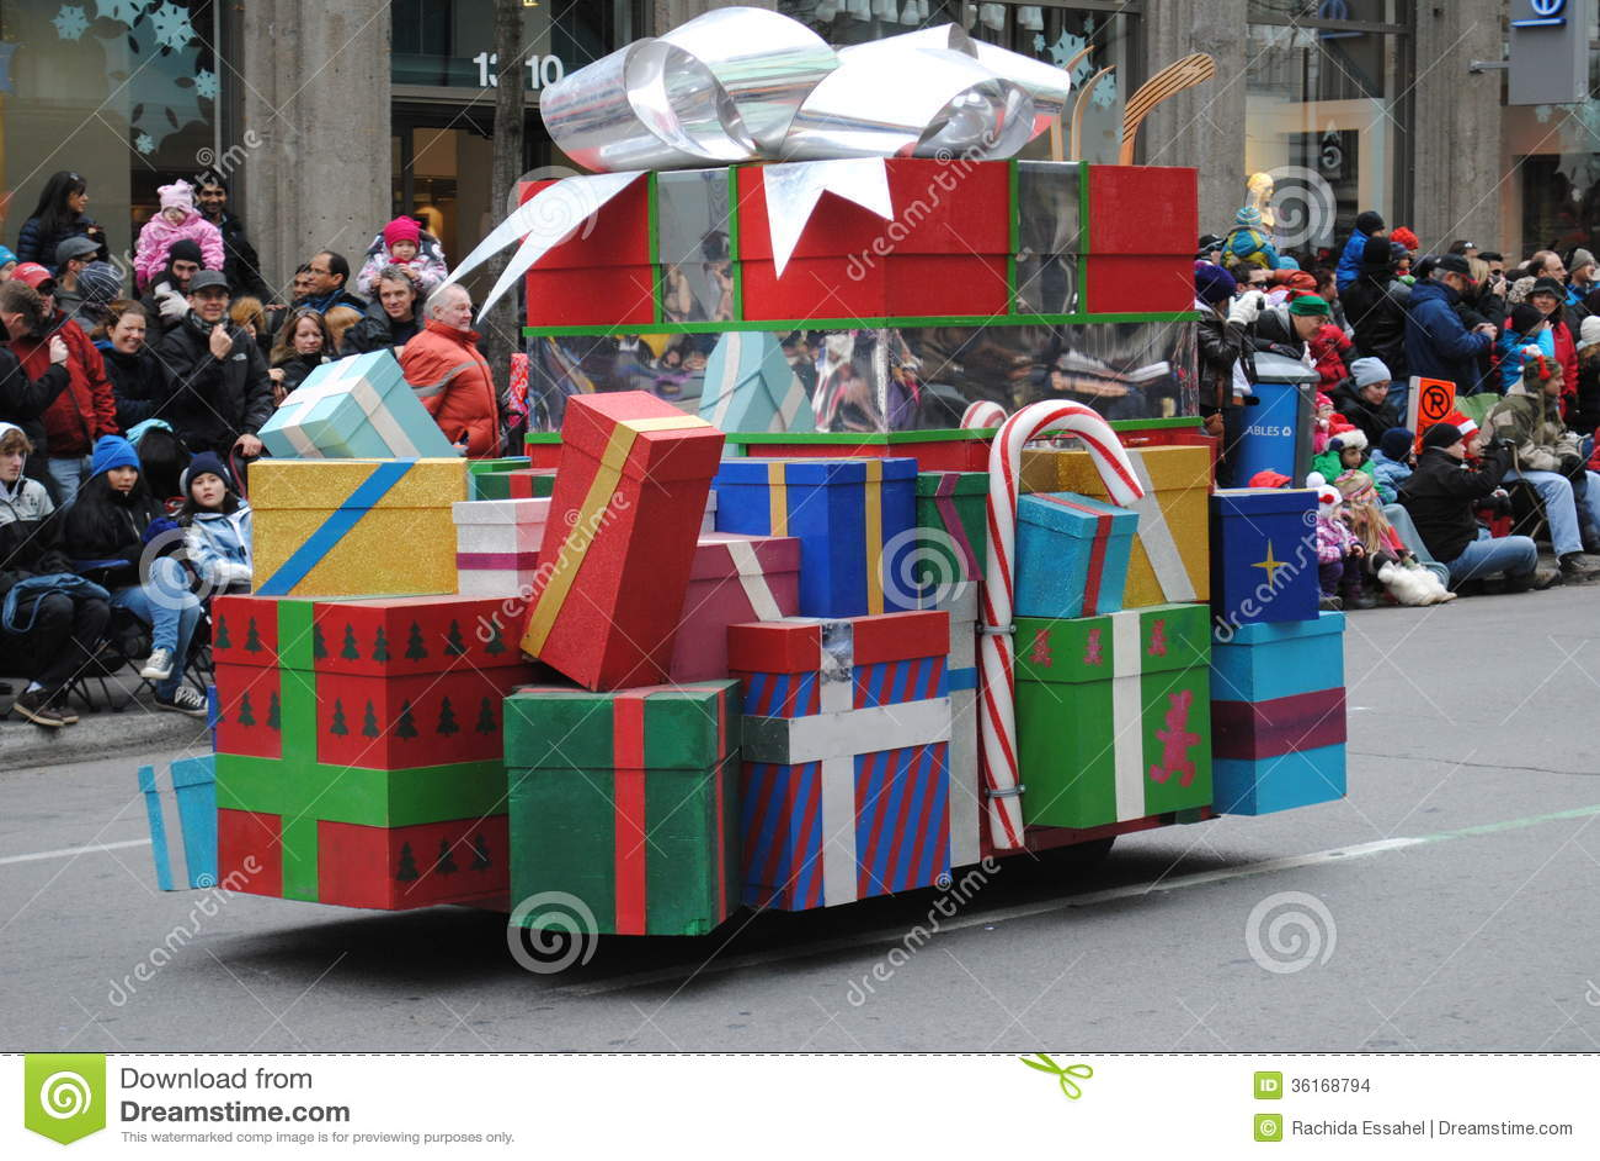 Фестиваль santa clous в Монреале